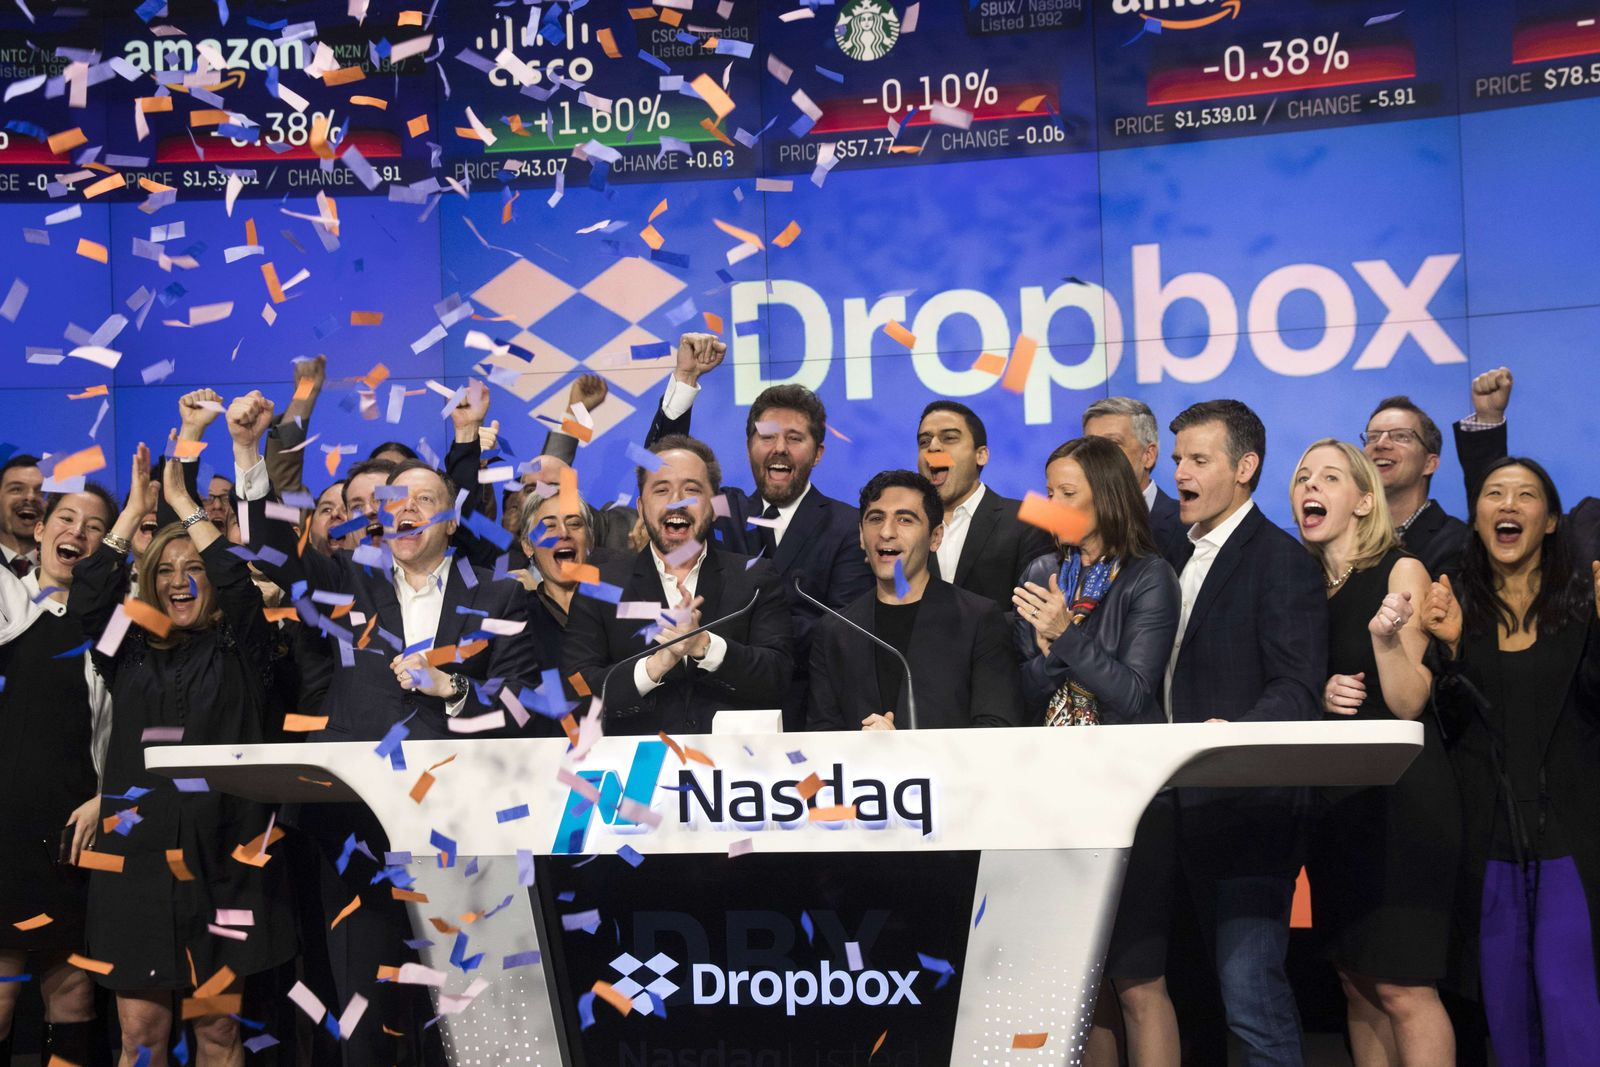 US-DROPBOX-DEBUTS-ON-NASDAQ-EXCHANGE